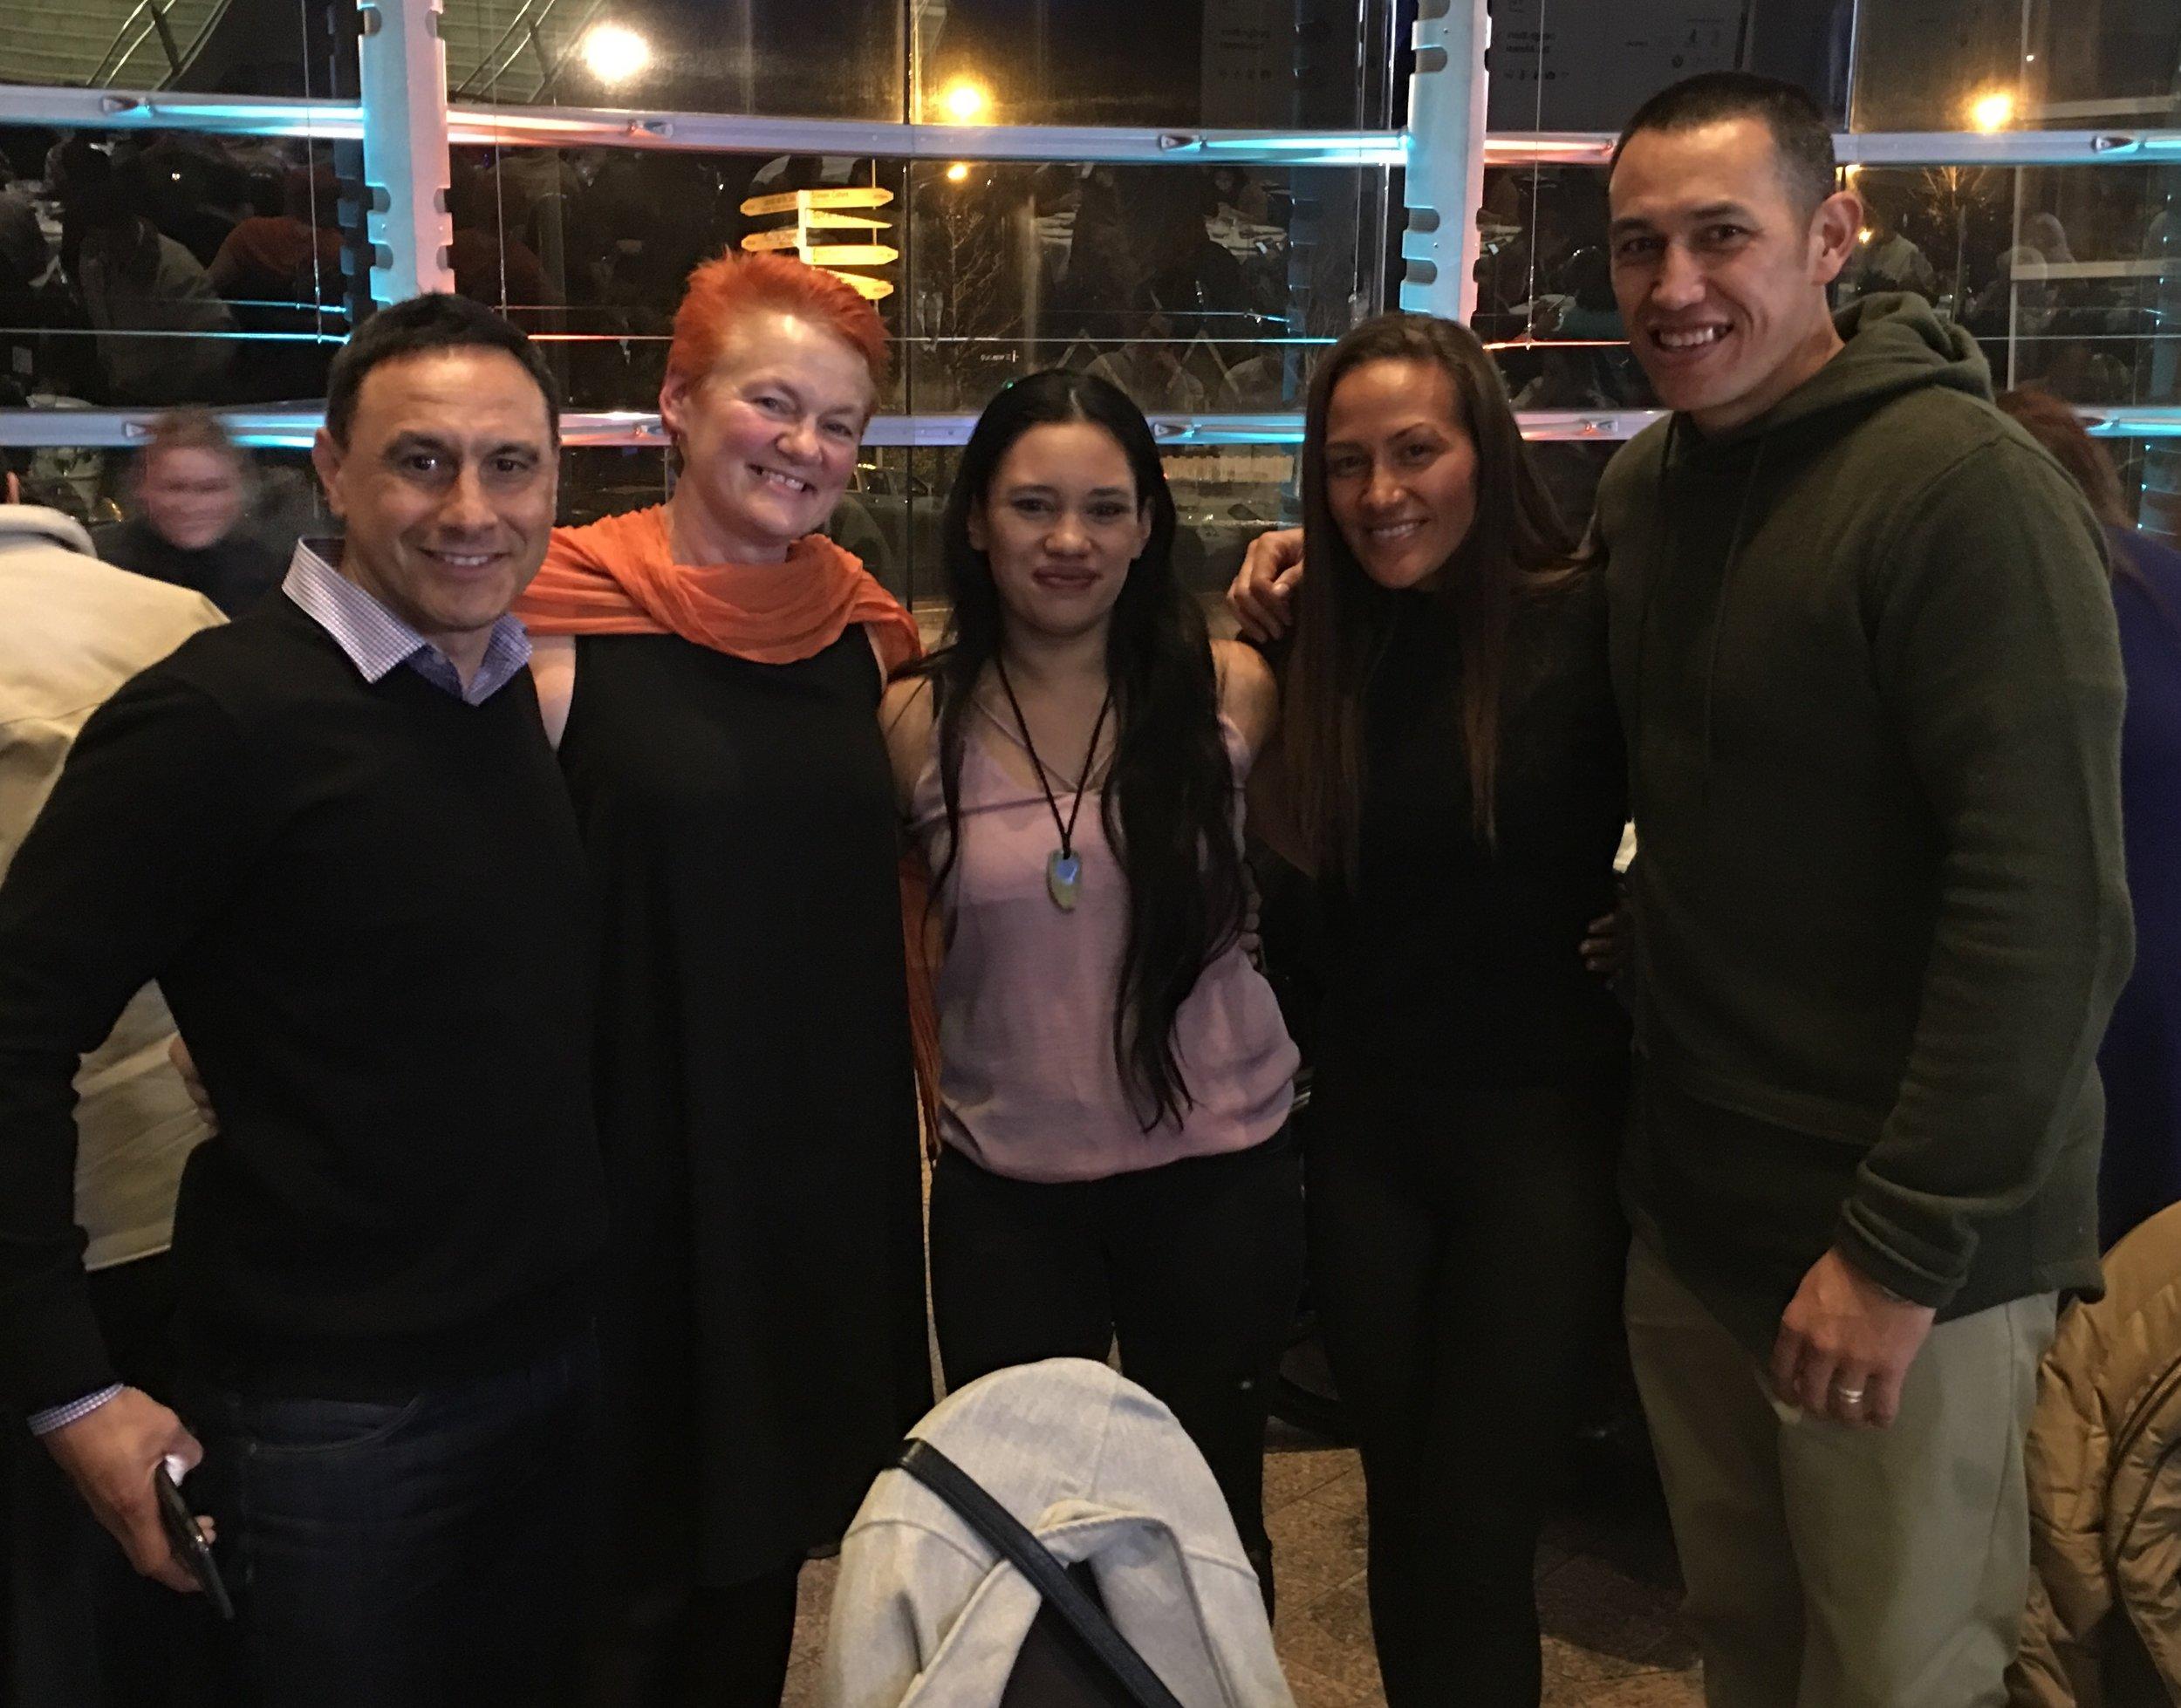 Super coach Karl Waretini with Yoga warrior princess and our HCC Superheroes